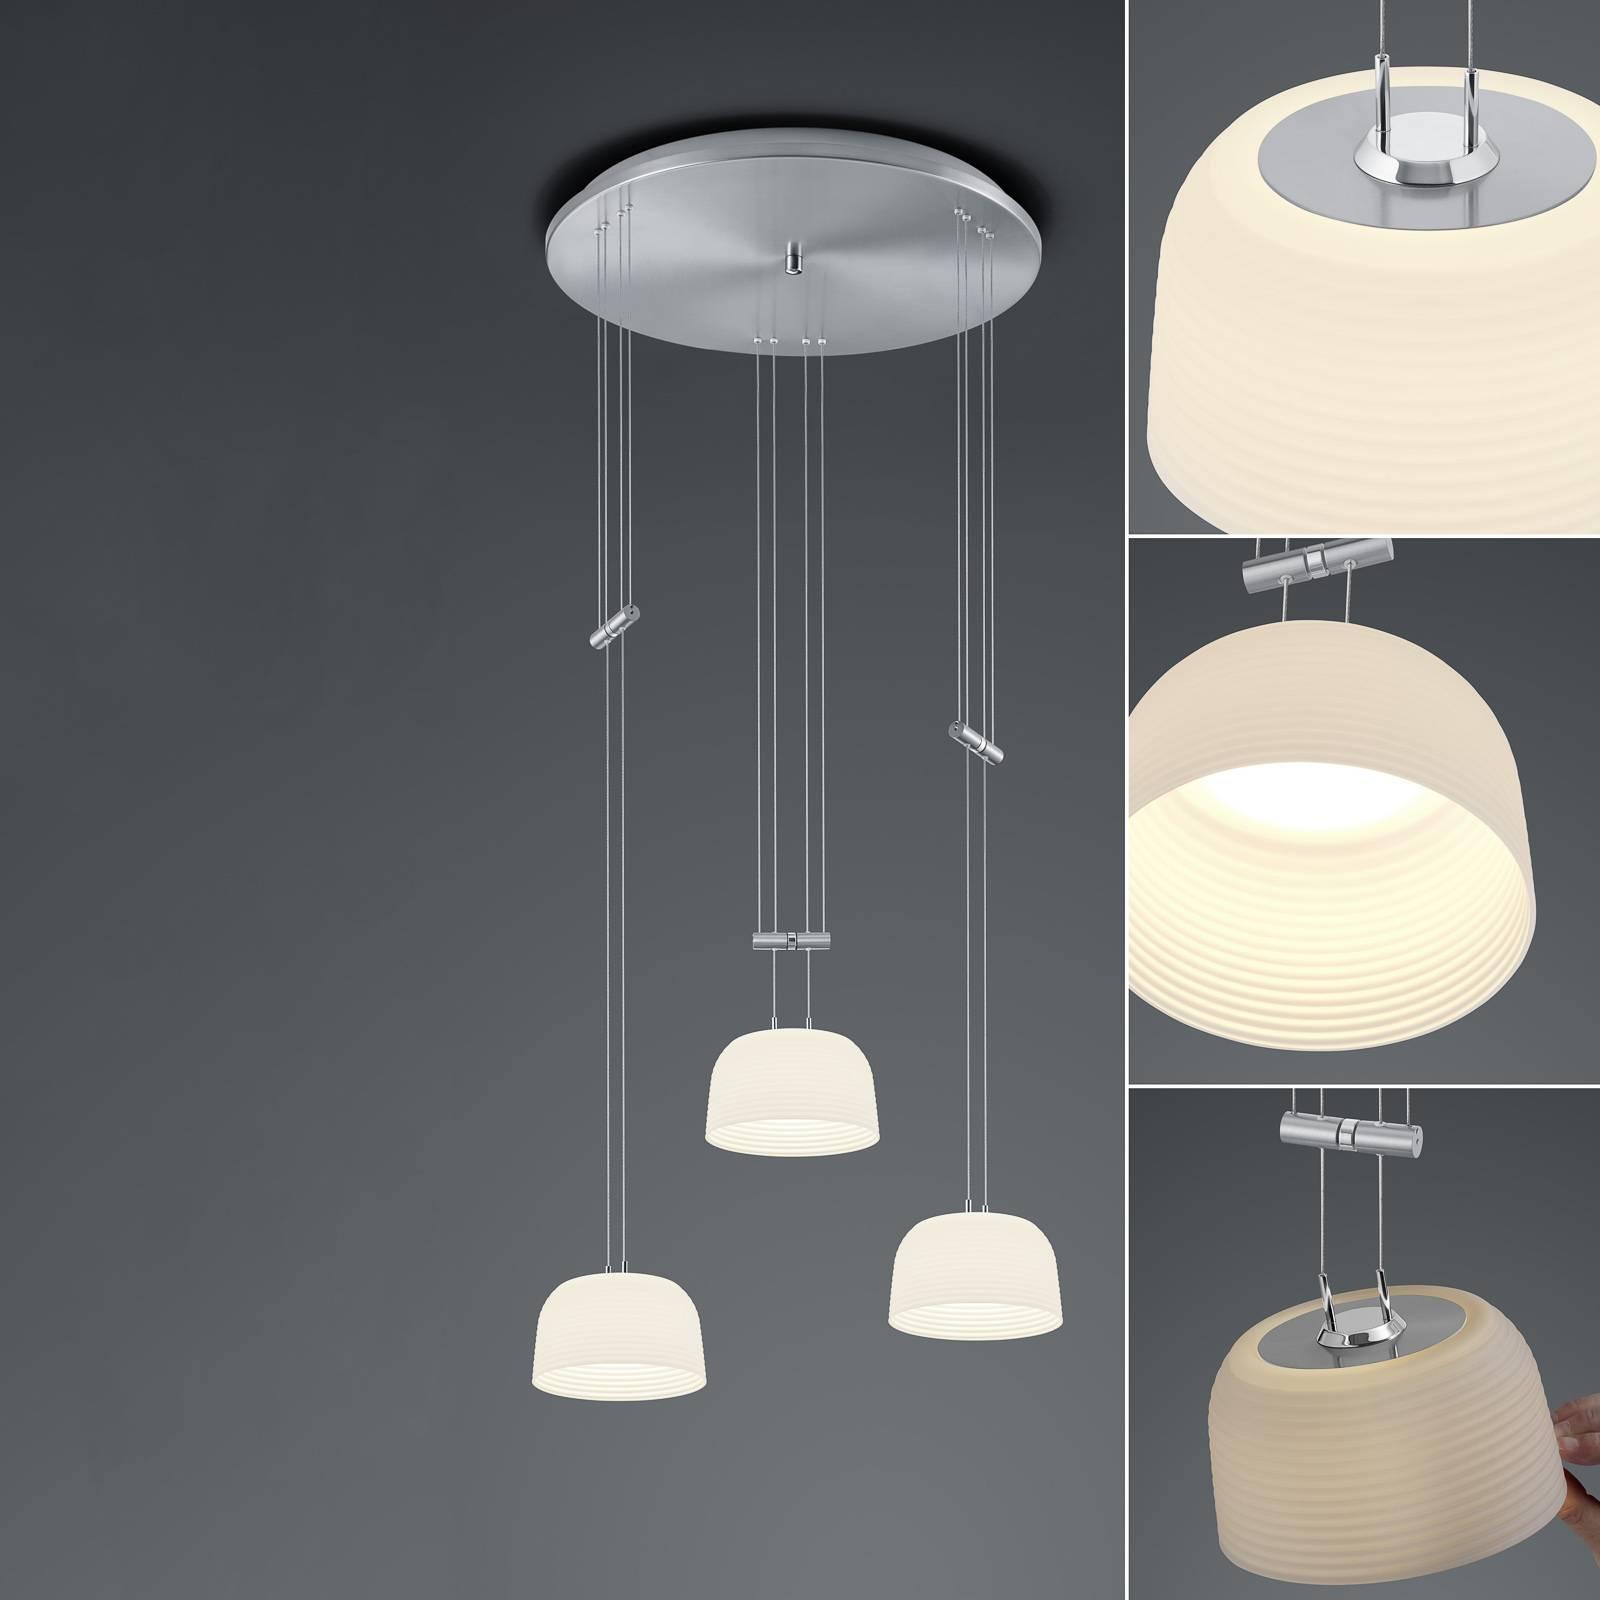 BANKAMP Nelia ZigBee 3-lamp. pyöreä nikkeli